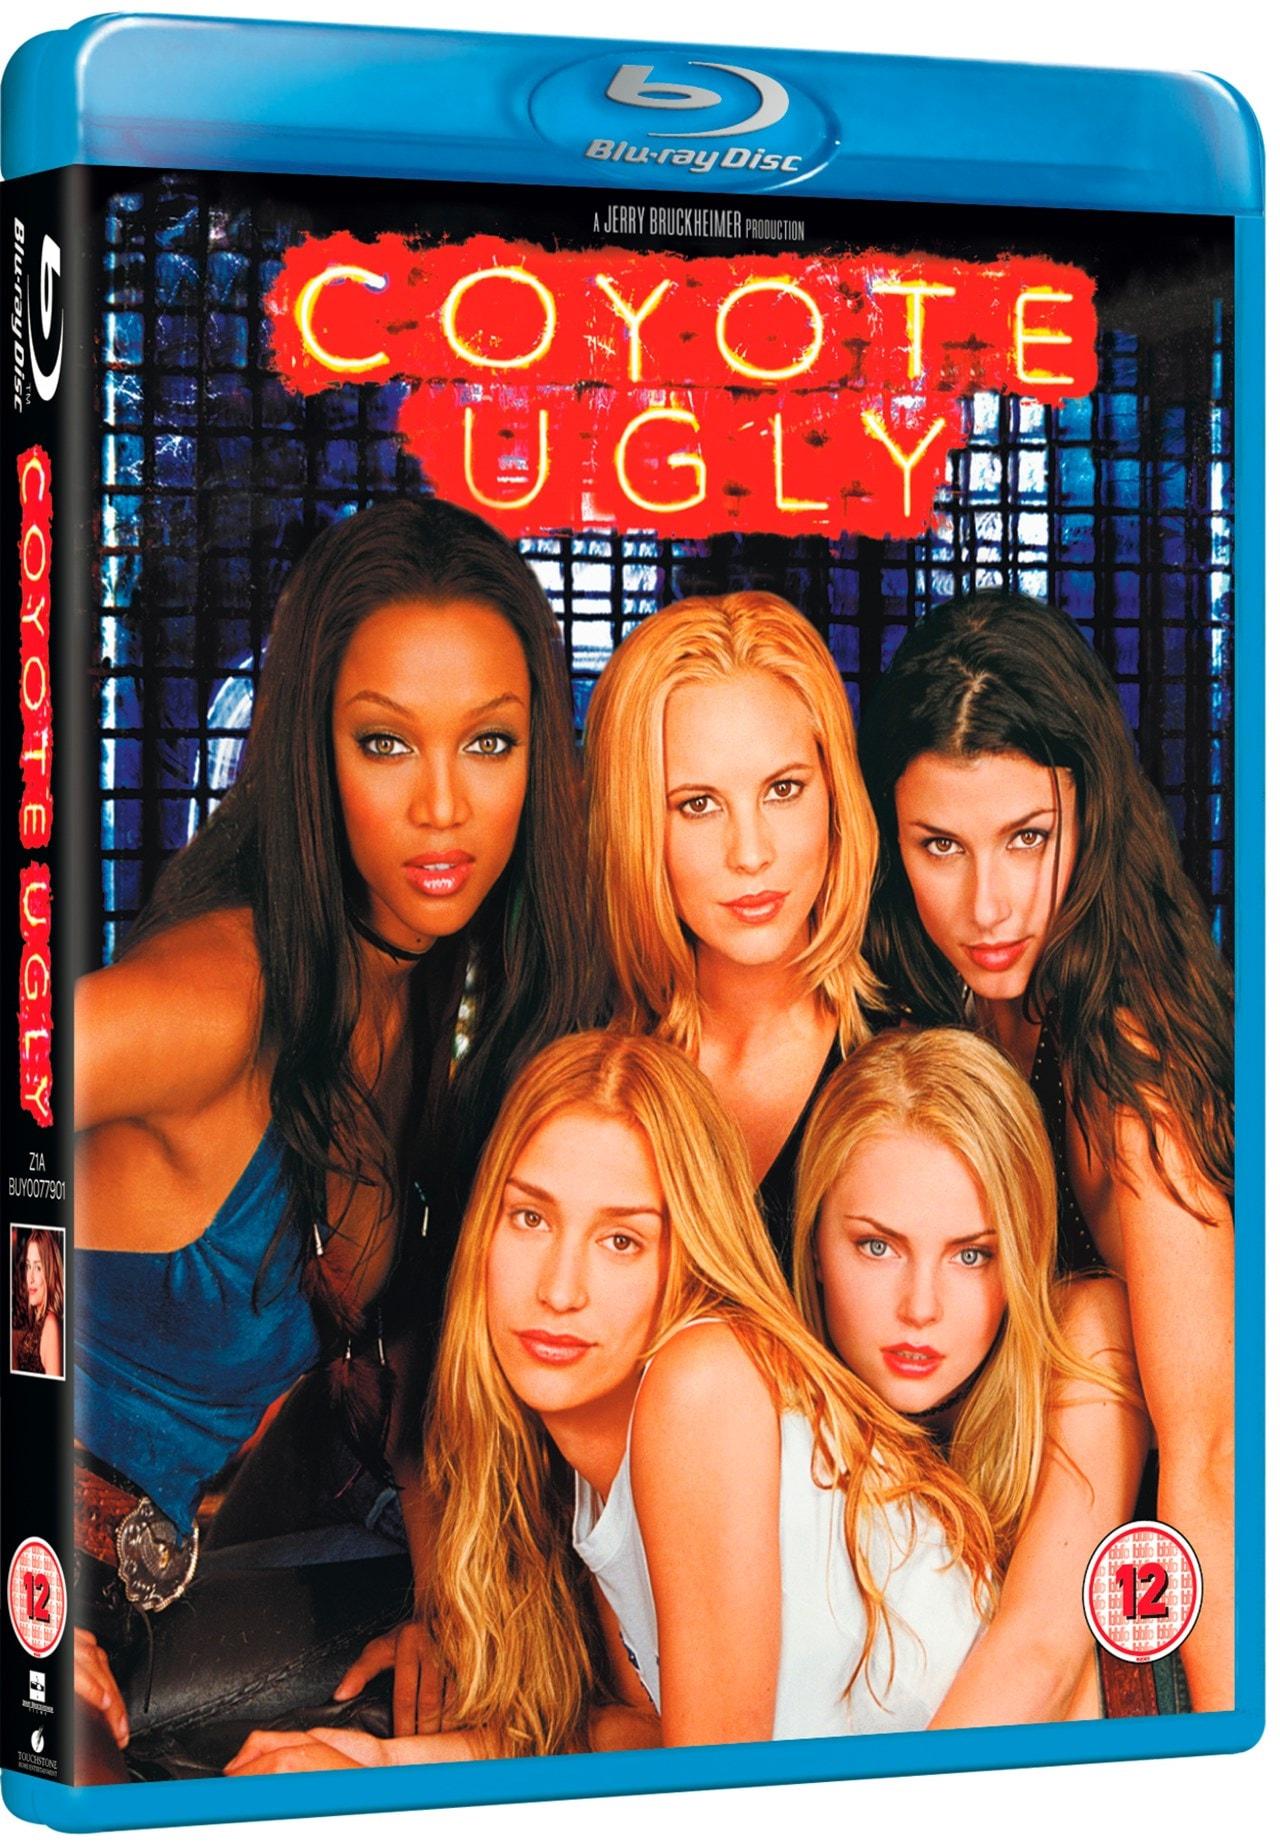 Coyote Ugly - 2